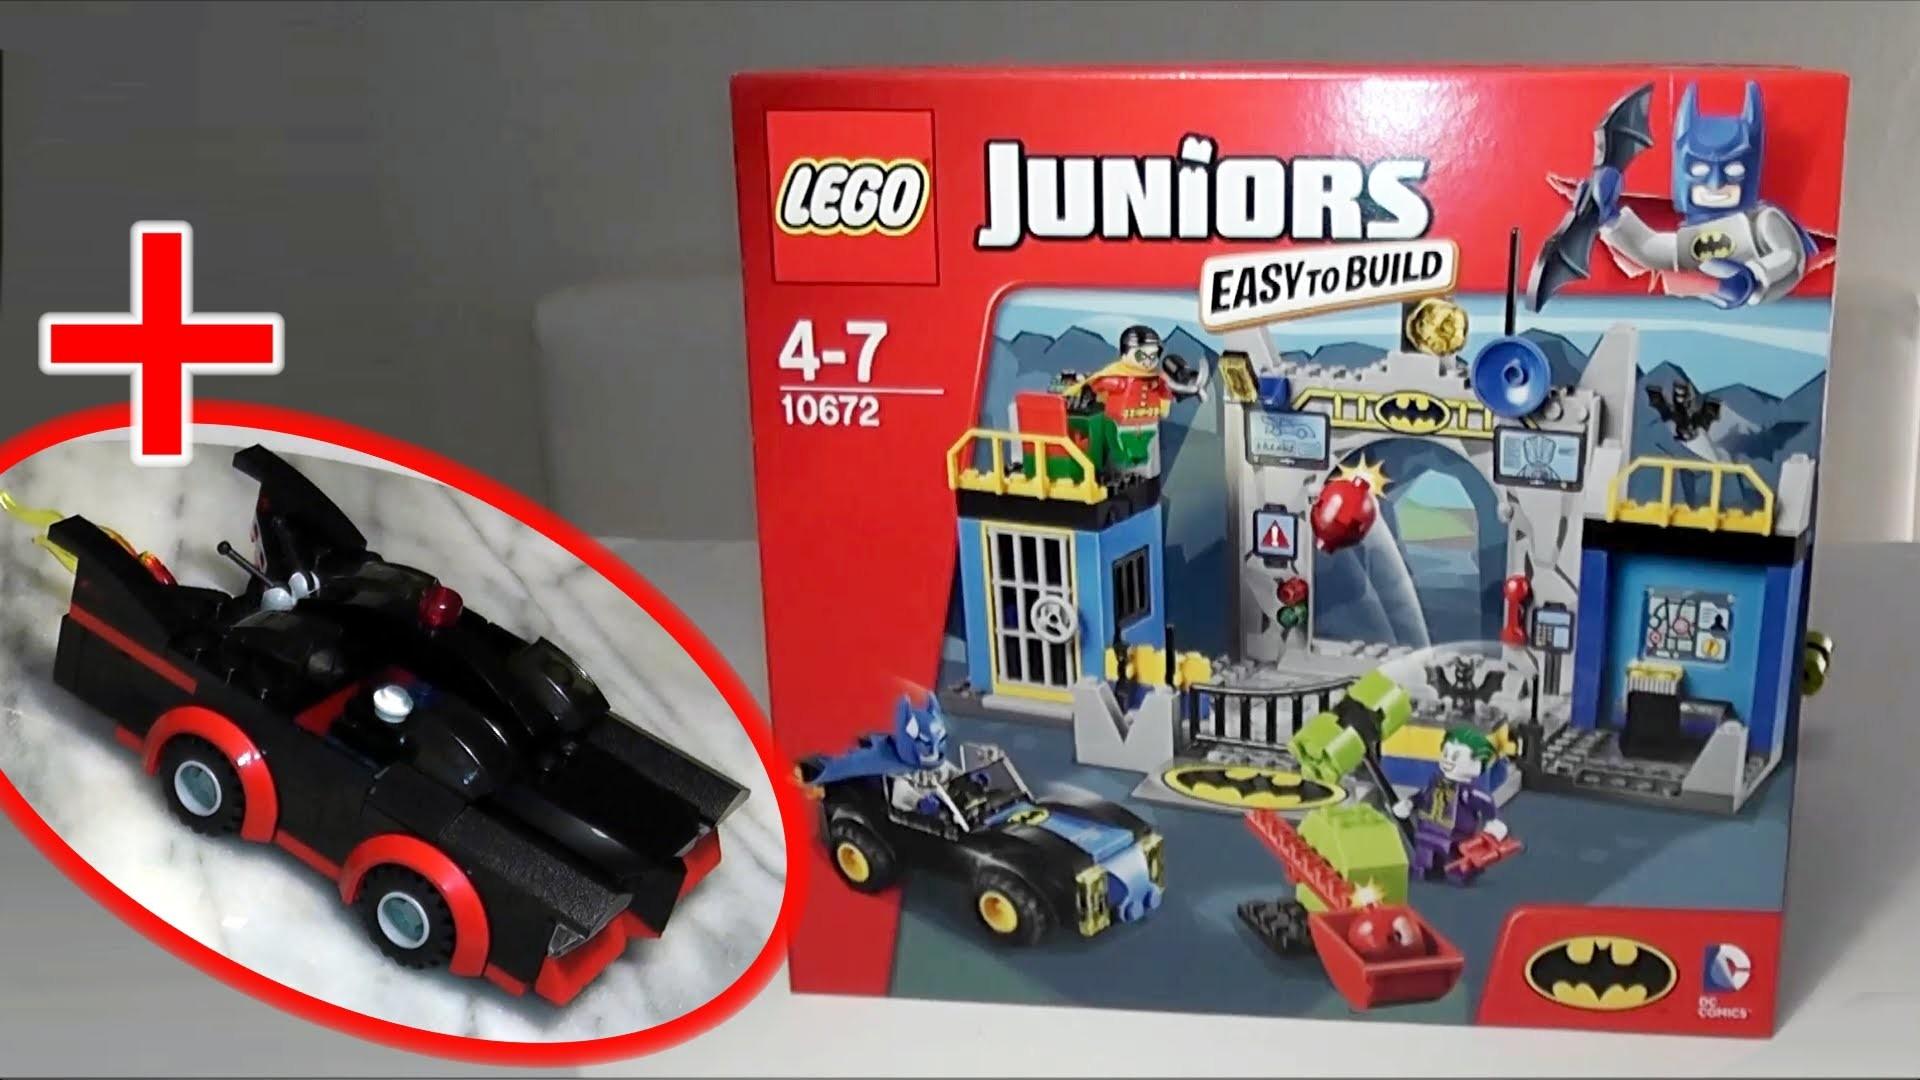 LEGO 10672 Juniors Batman: Verteidigung der Bath̦hle + 2014 SDCC-1966  Batmobile РReview deutsch РРYouTube